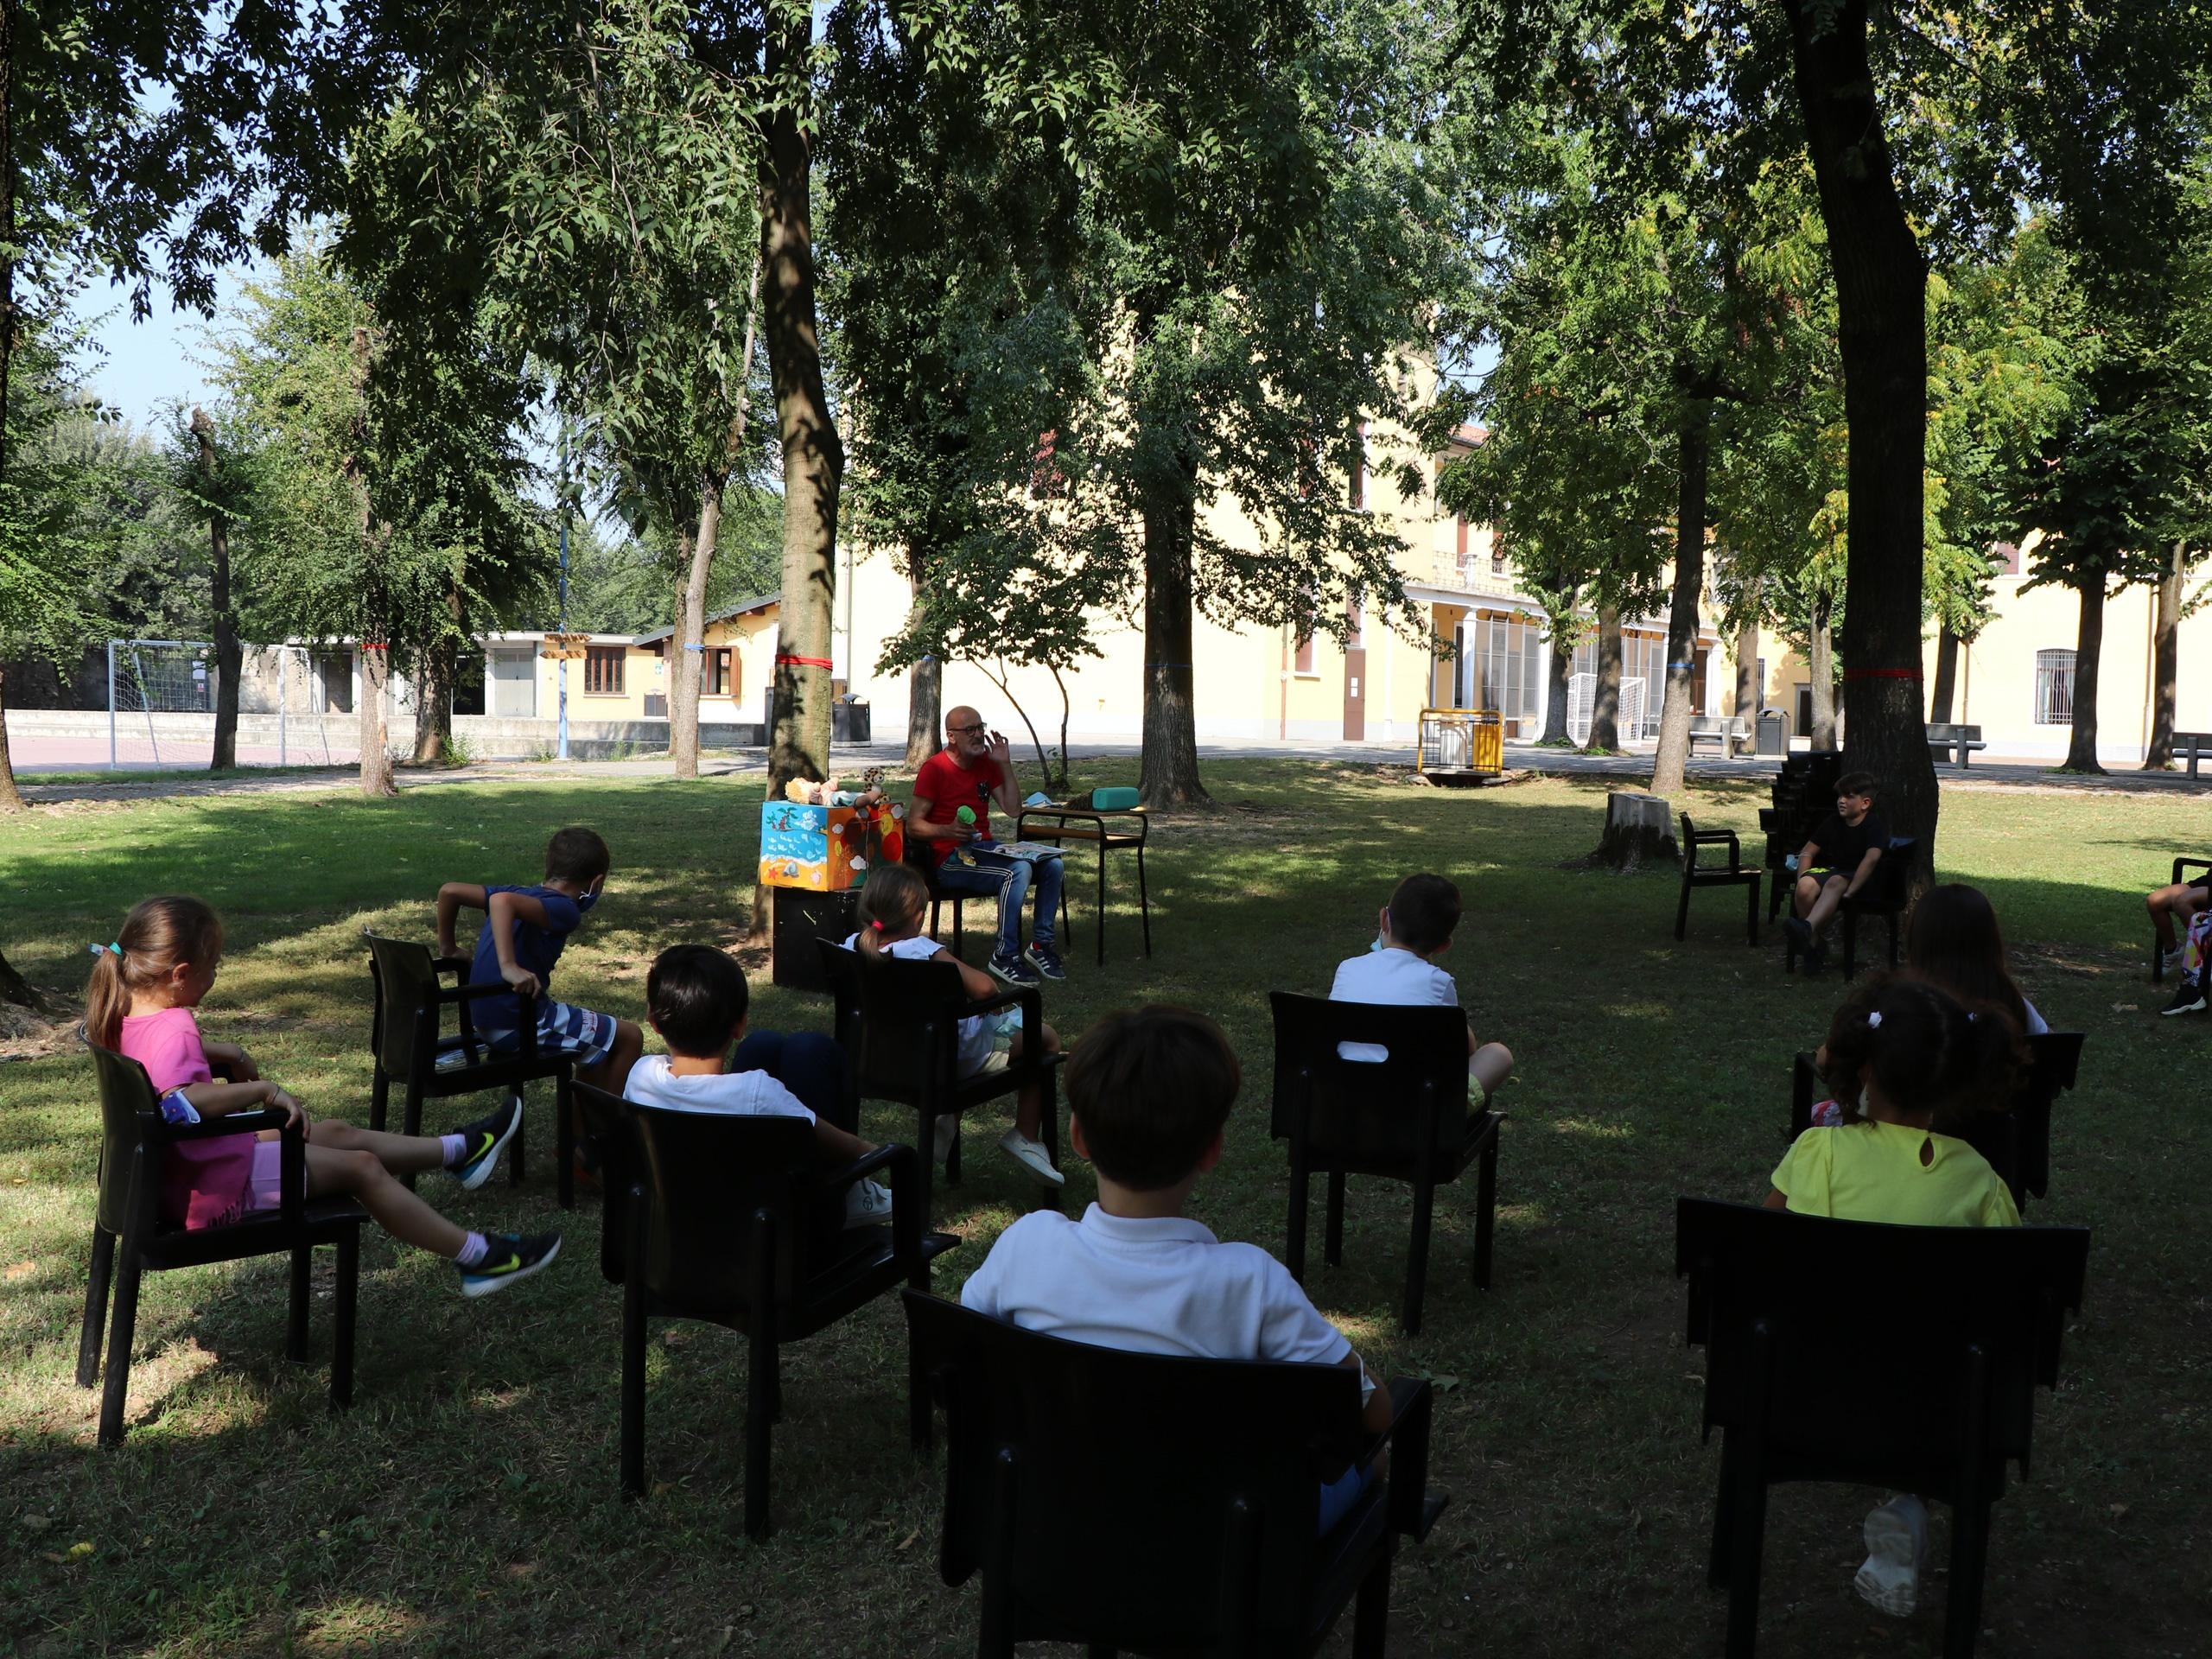 scuola primaria - San Bernardino - Chiari - Scuola Paritaria